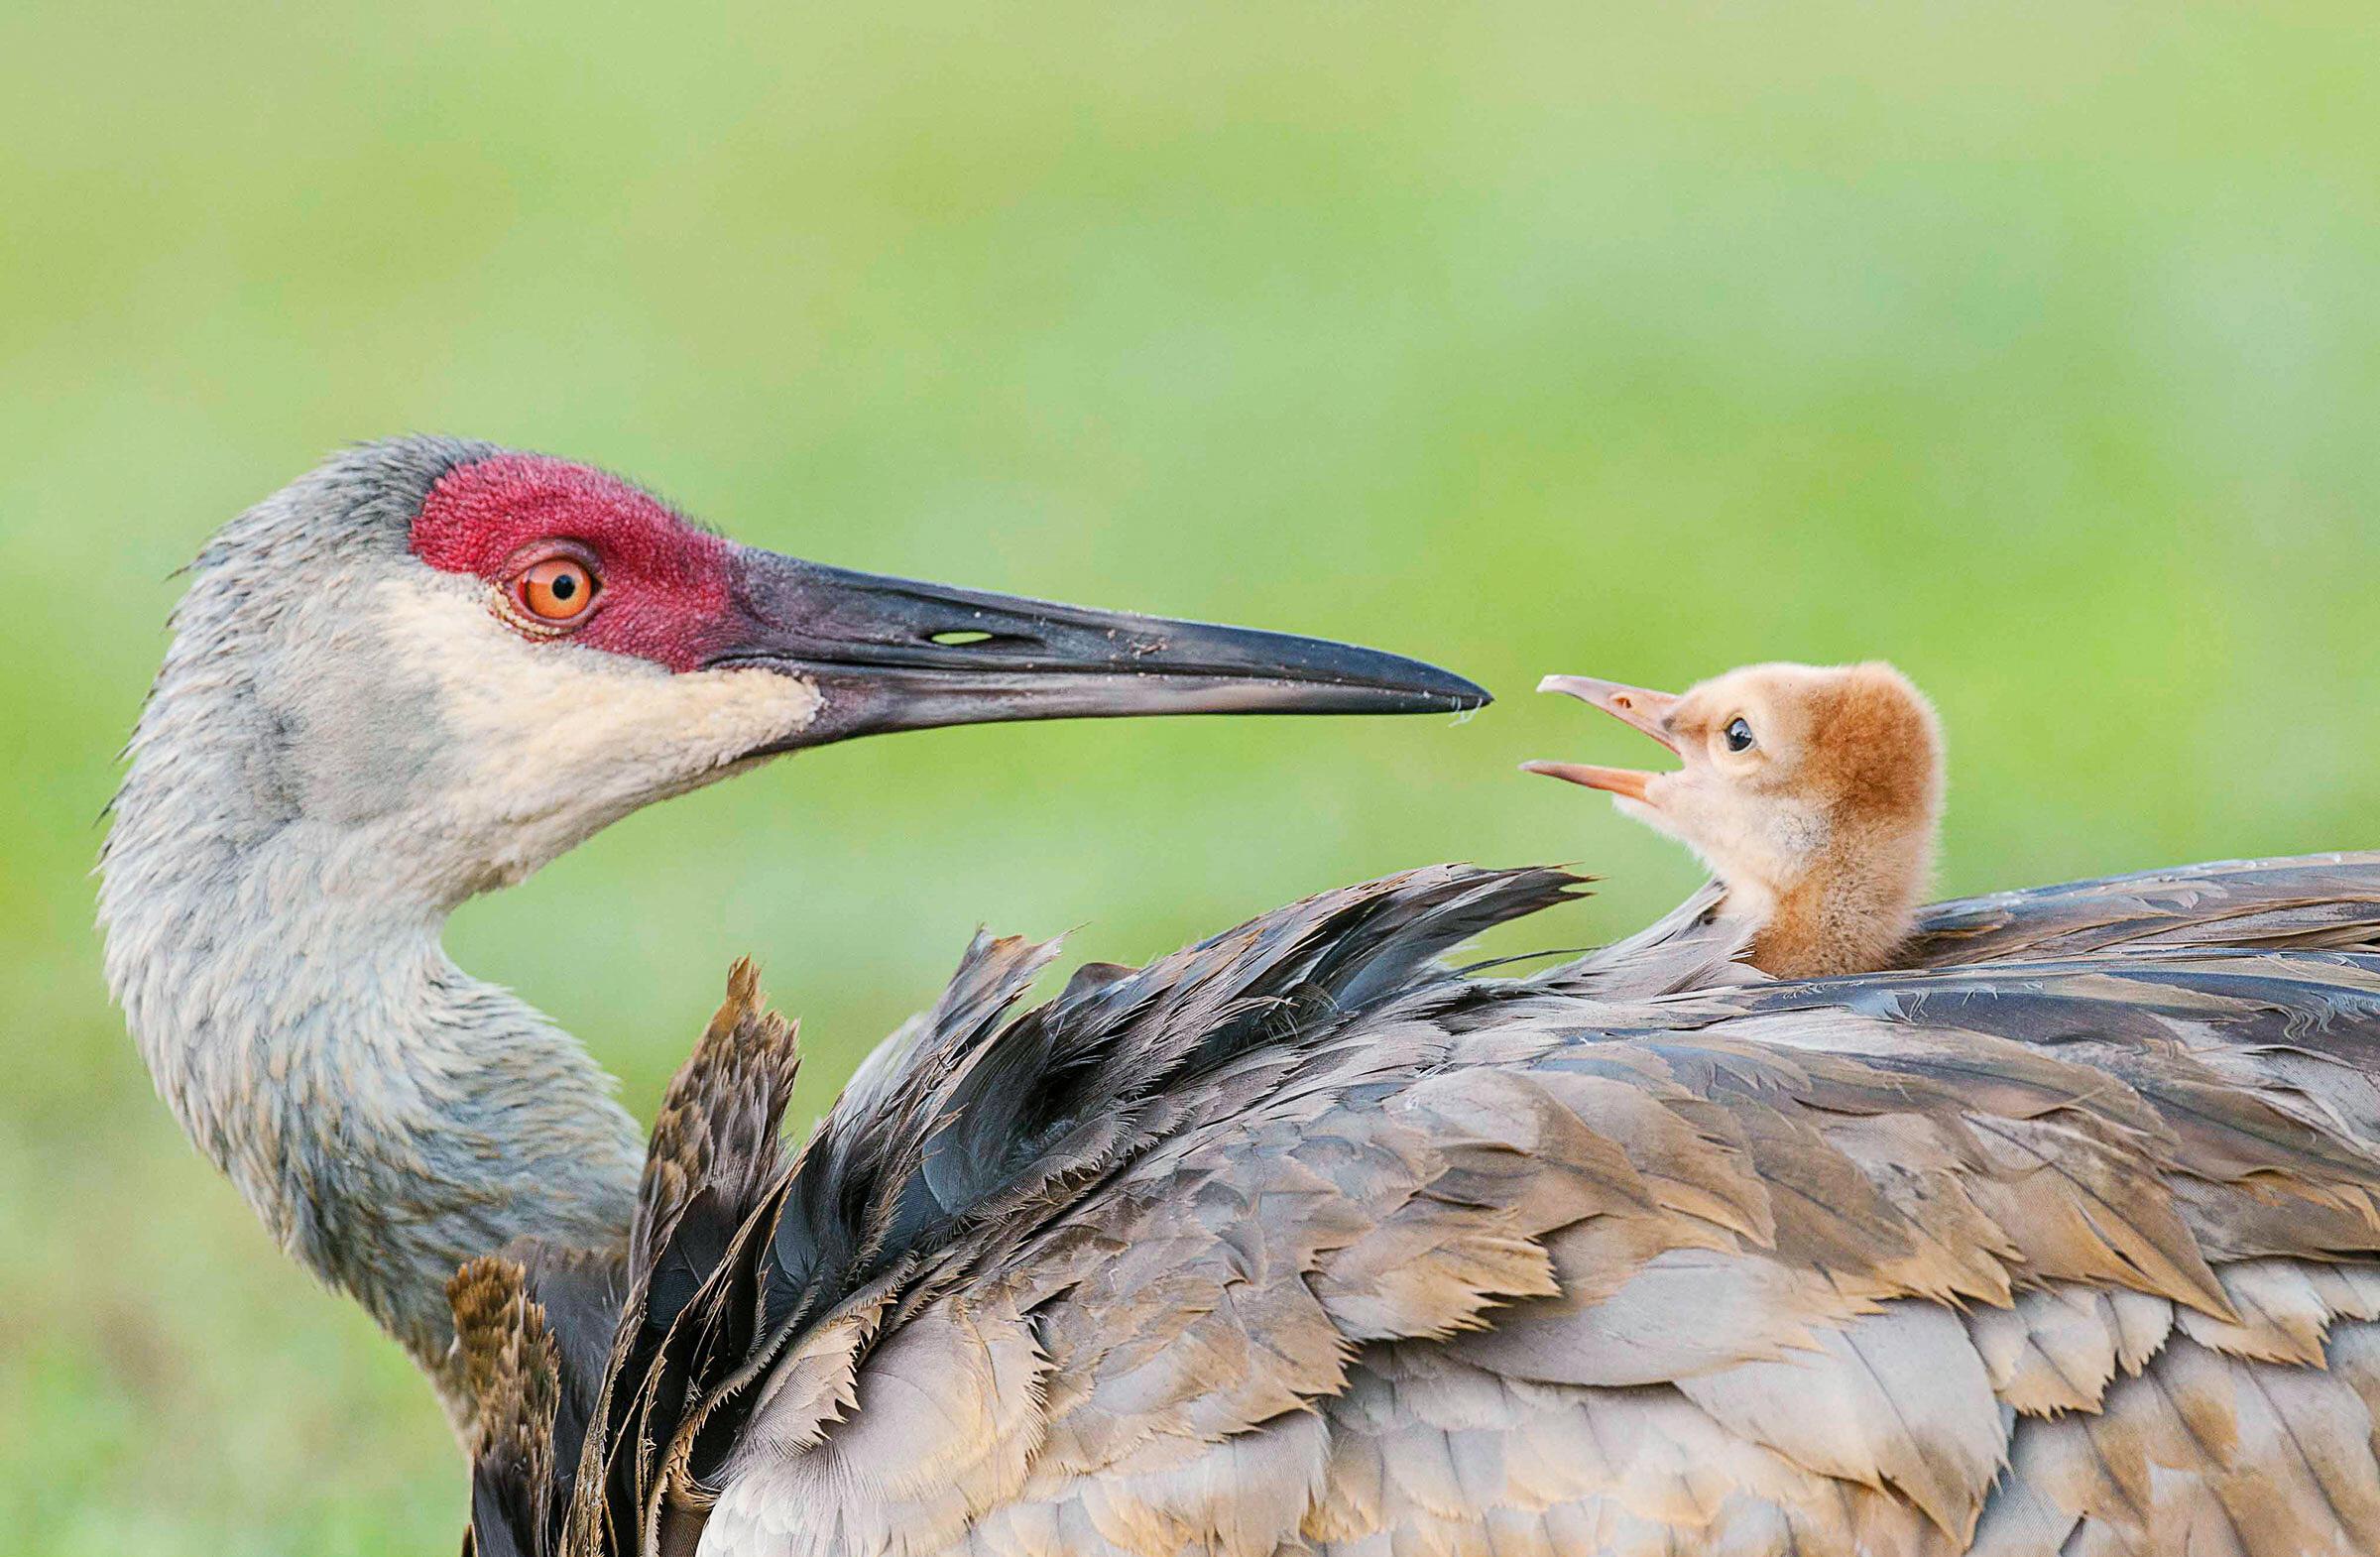 Sandhill Cranes. Ursula Dubrick/Audubon Photography Awards